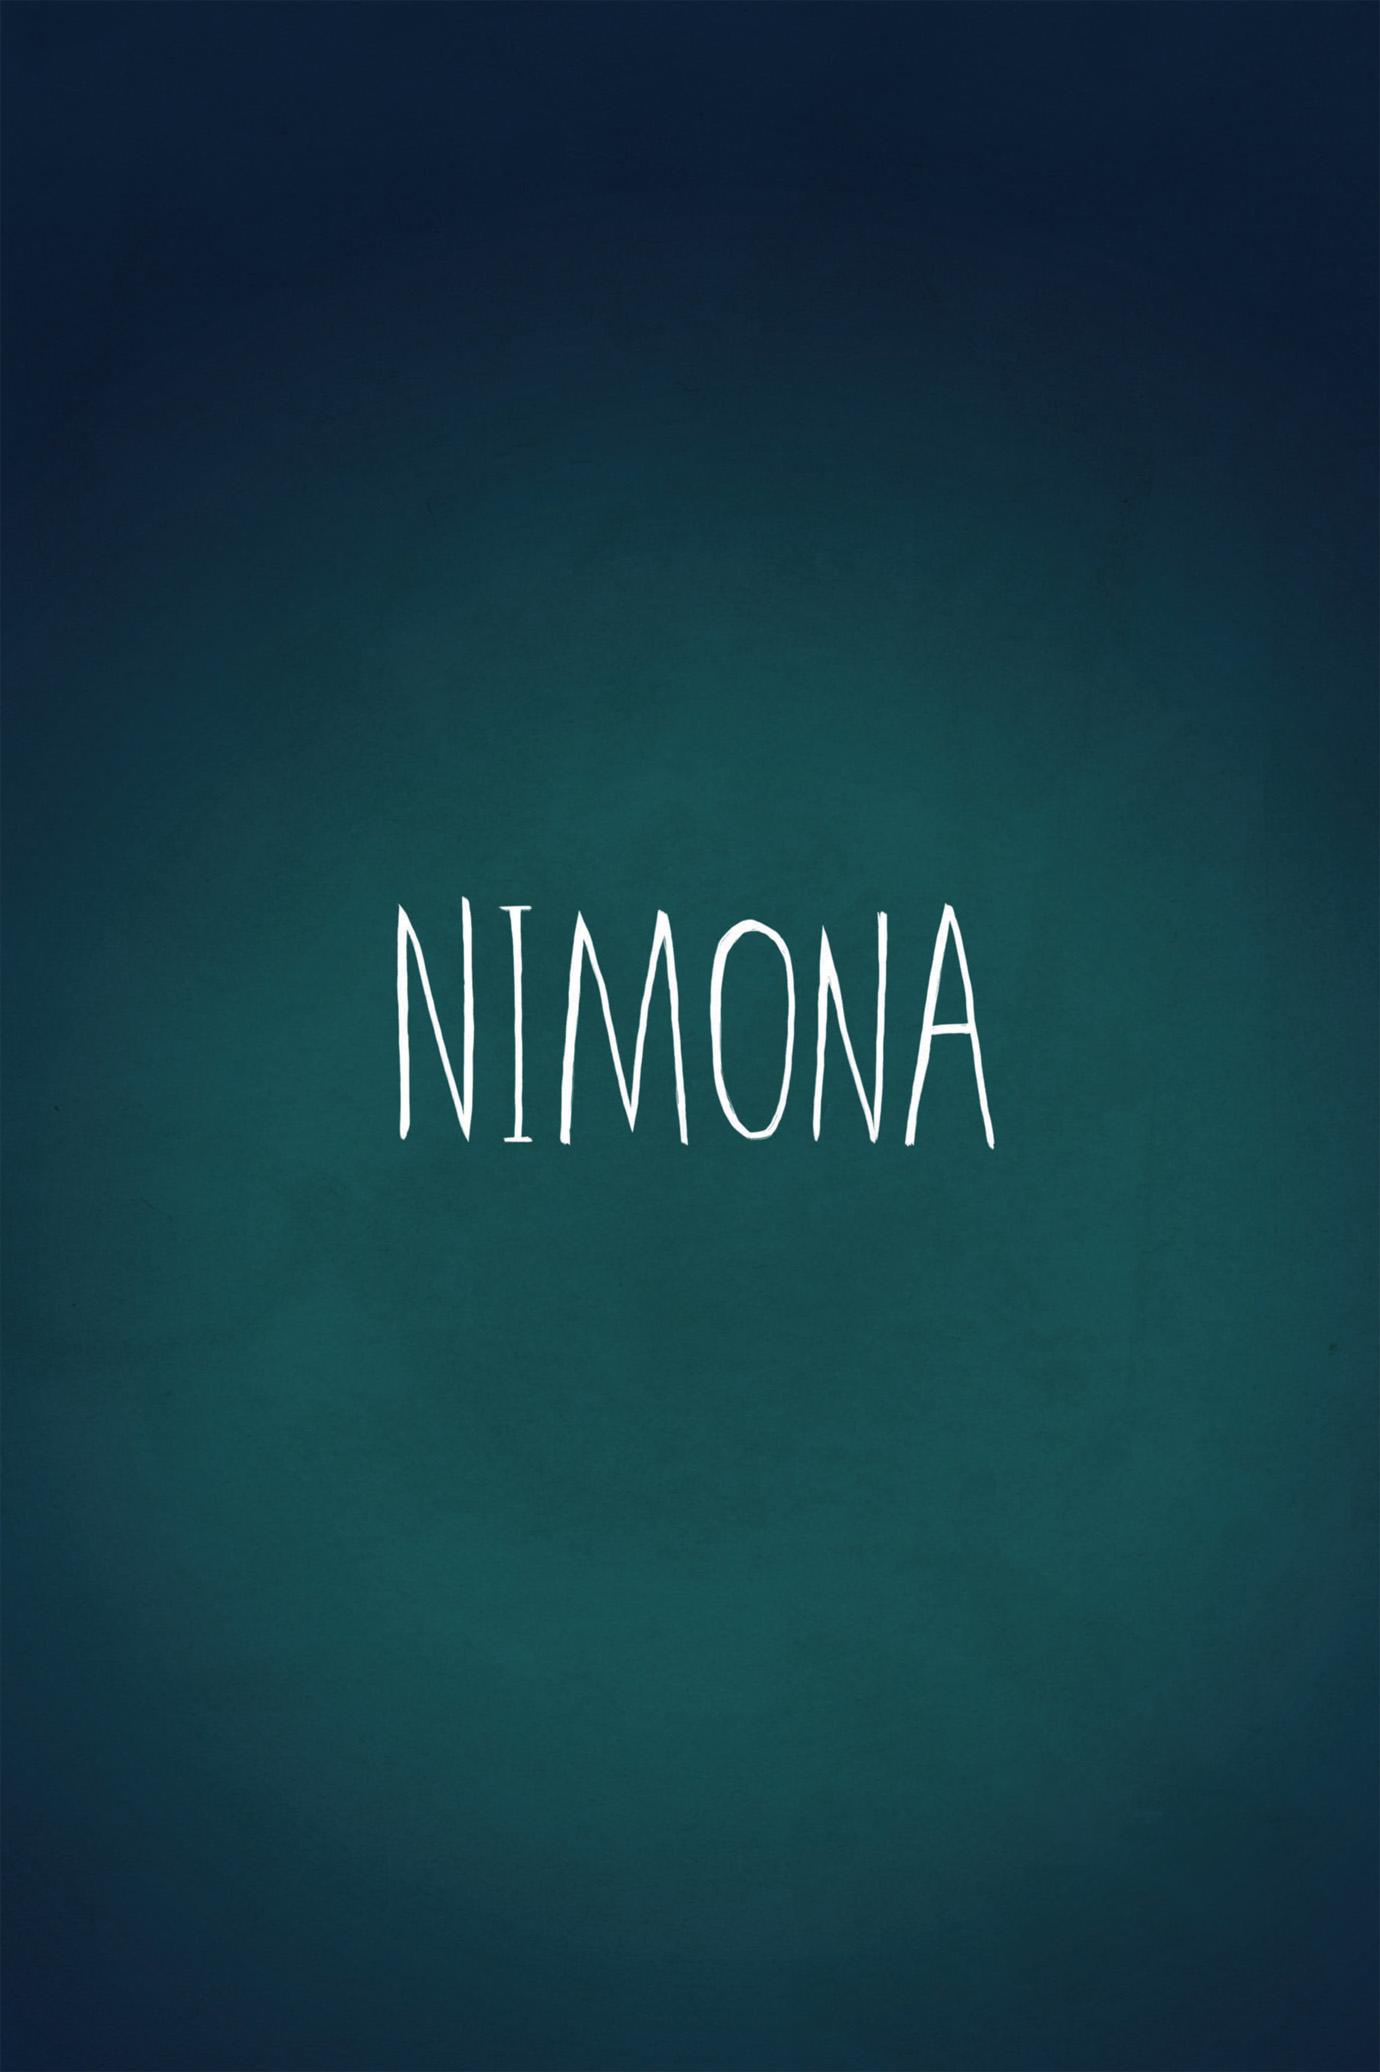 Nimona TPB Page 1